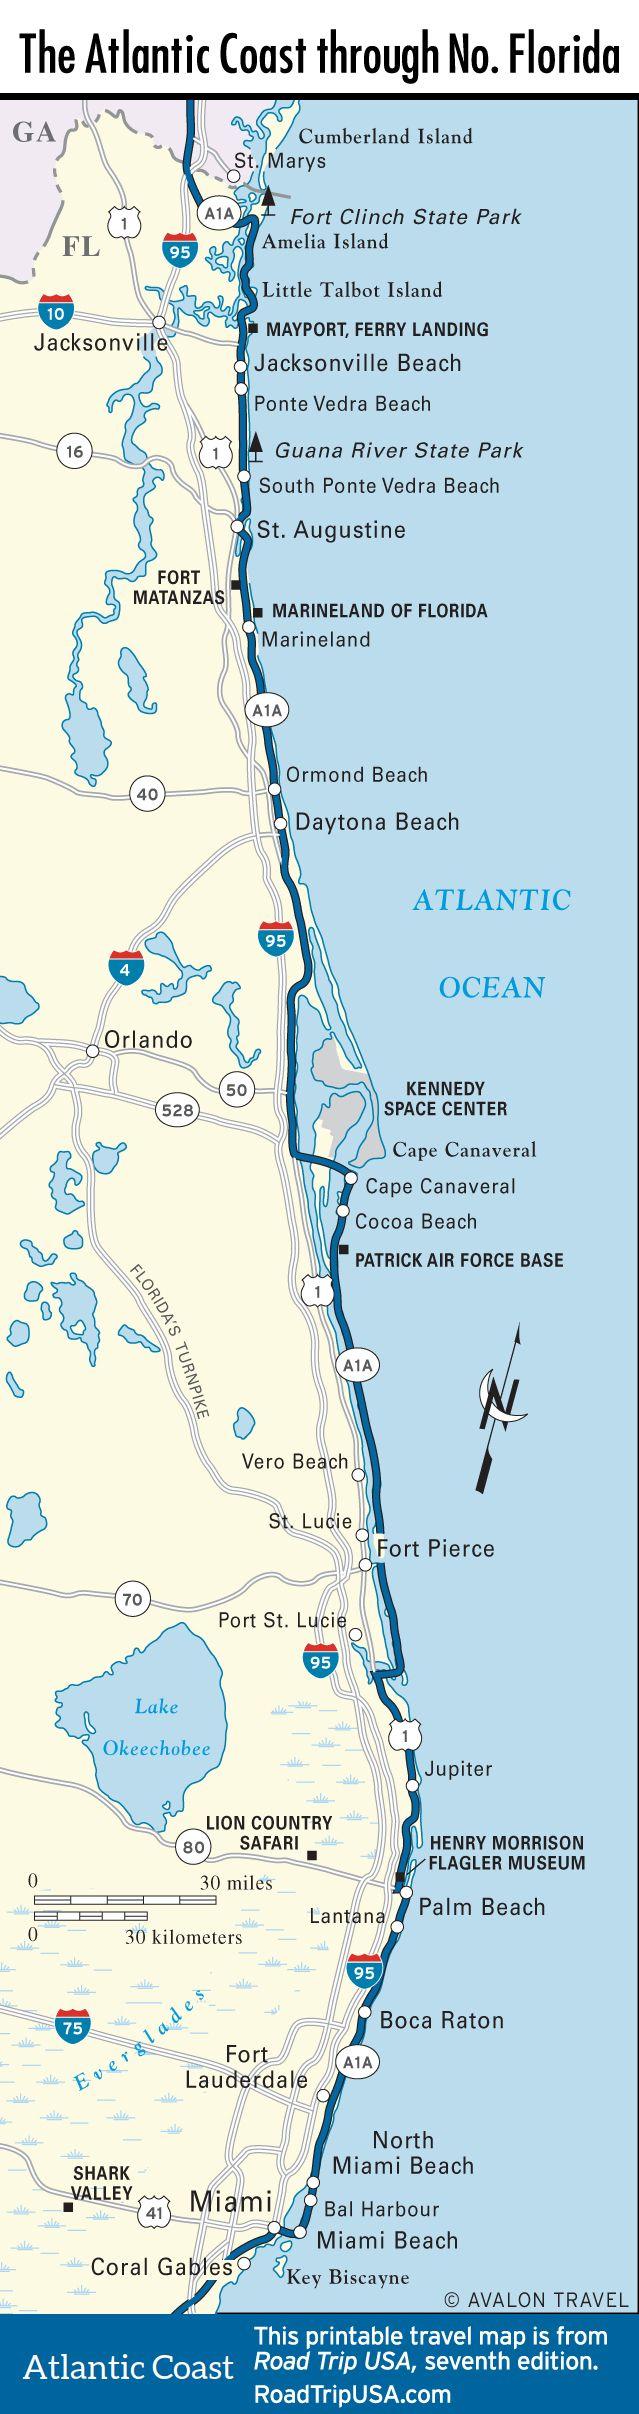 Map Of The Atlantic Coast Through Northern Florida.   Florida A1A - Florida East Coast Beaches Map